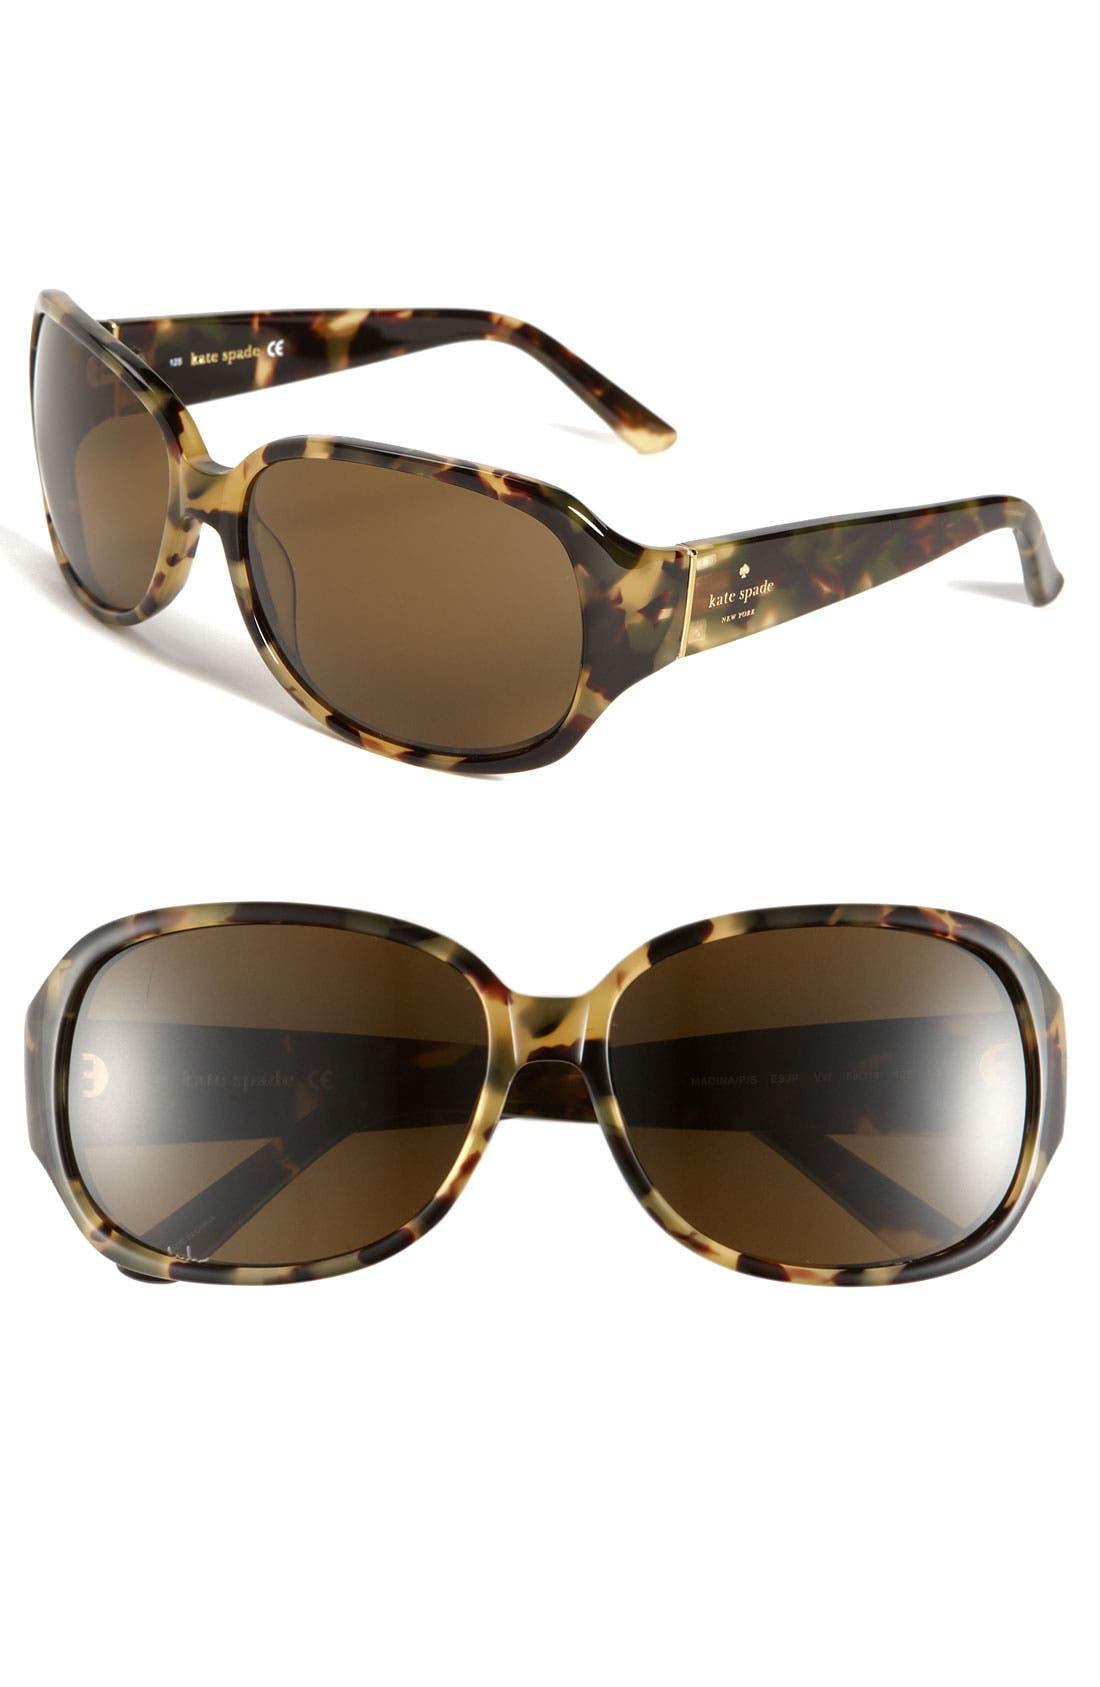 Main Image - kate spade new york 'madina' 58mm polarized sunglasses